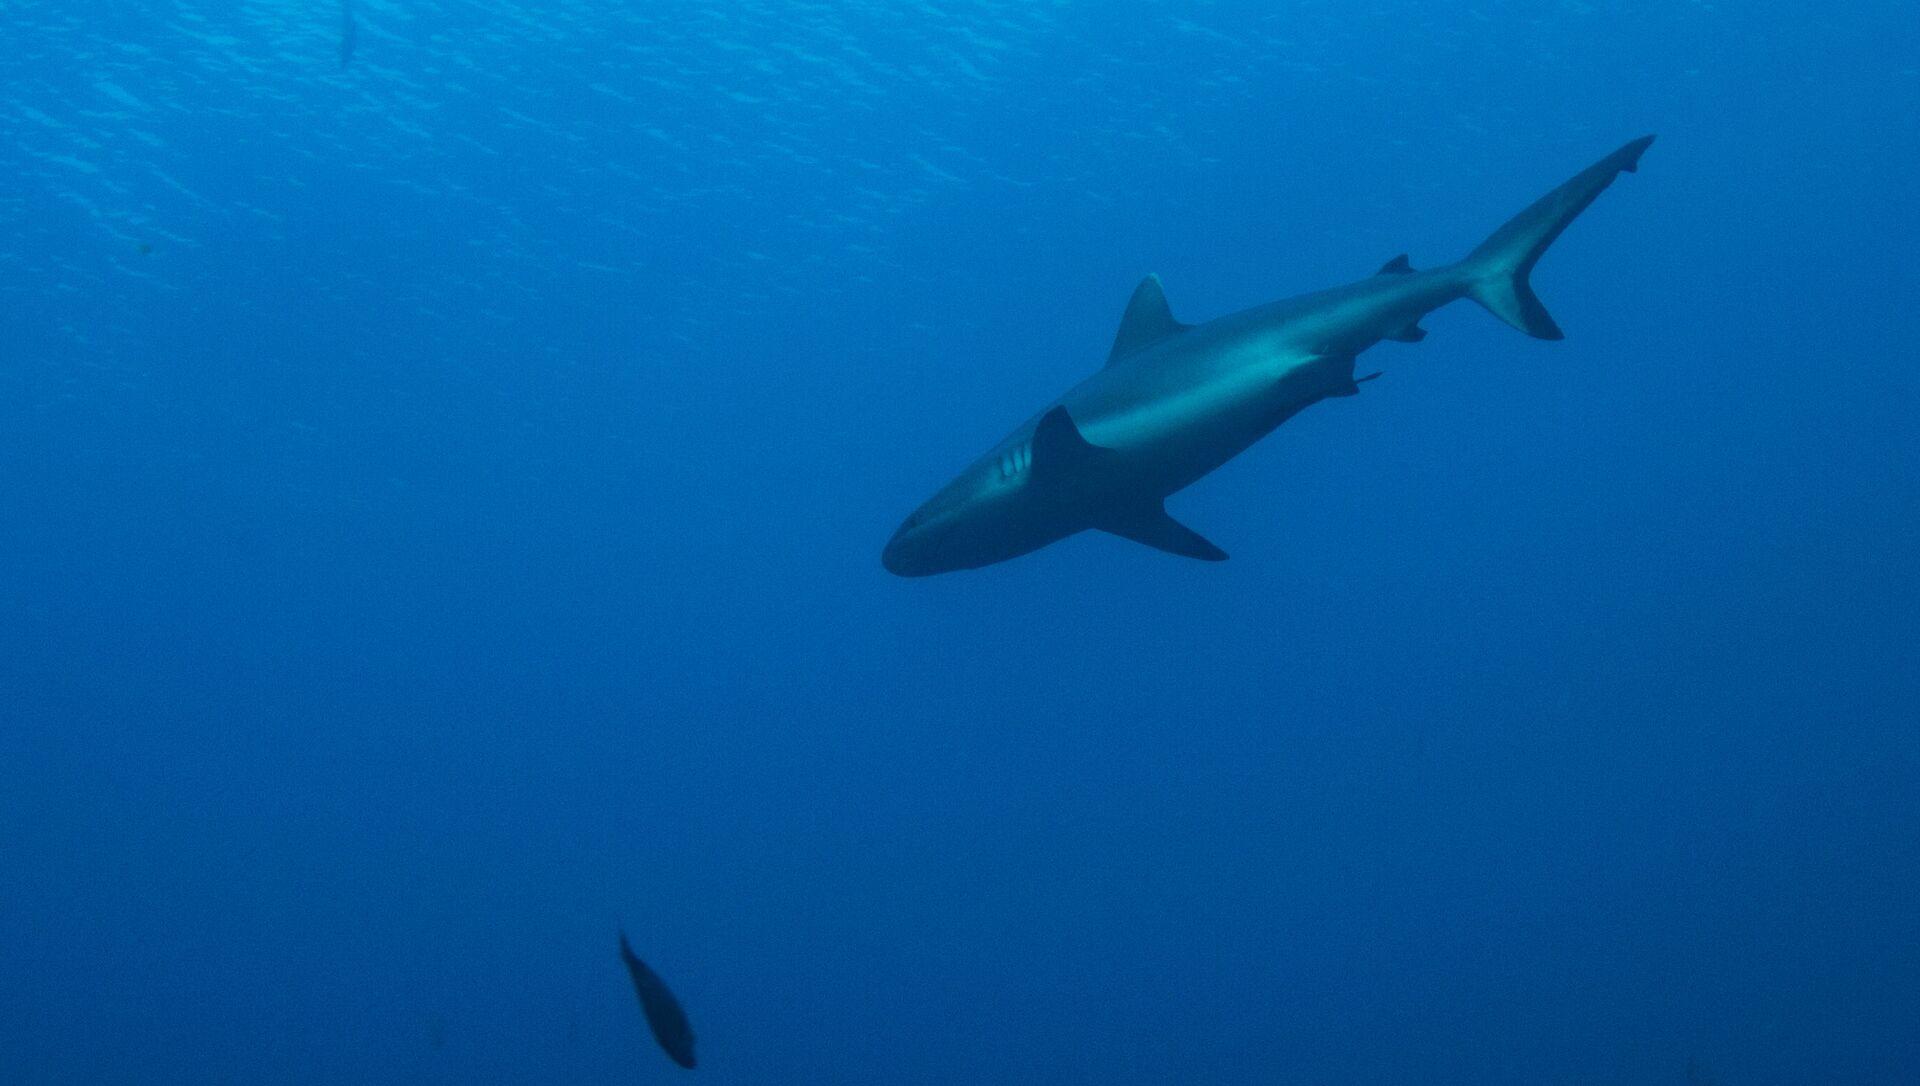 Un tiburón de arrecife de punta blanca - Sputnik Mundo, 1920, 03.02.2021